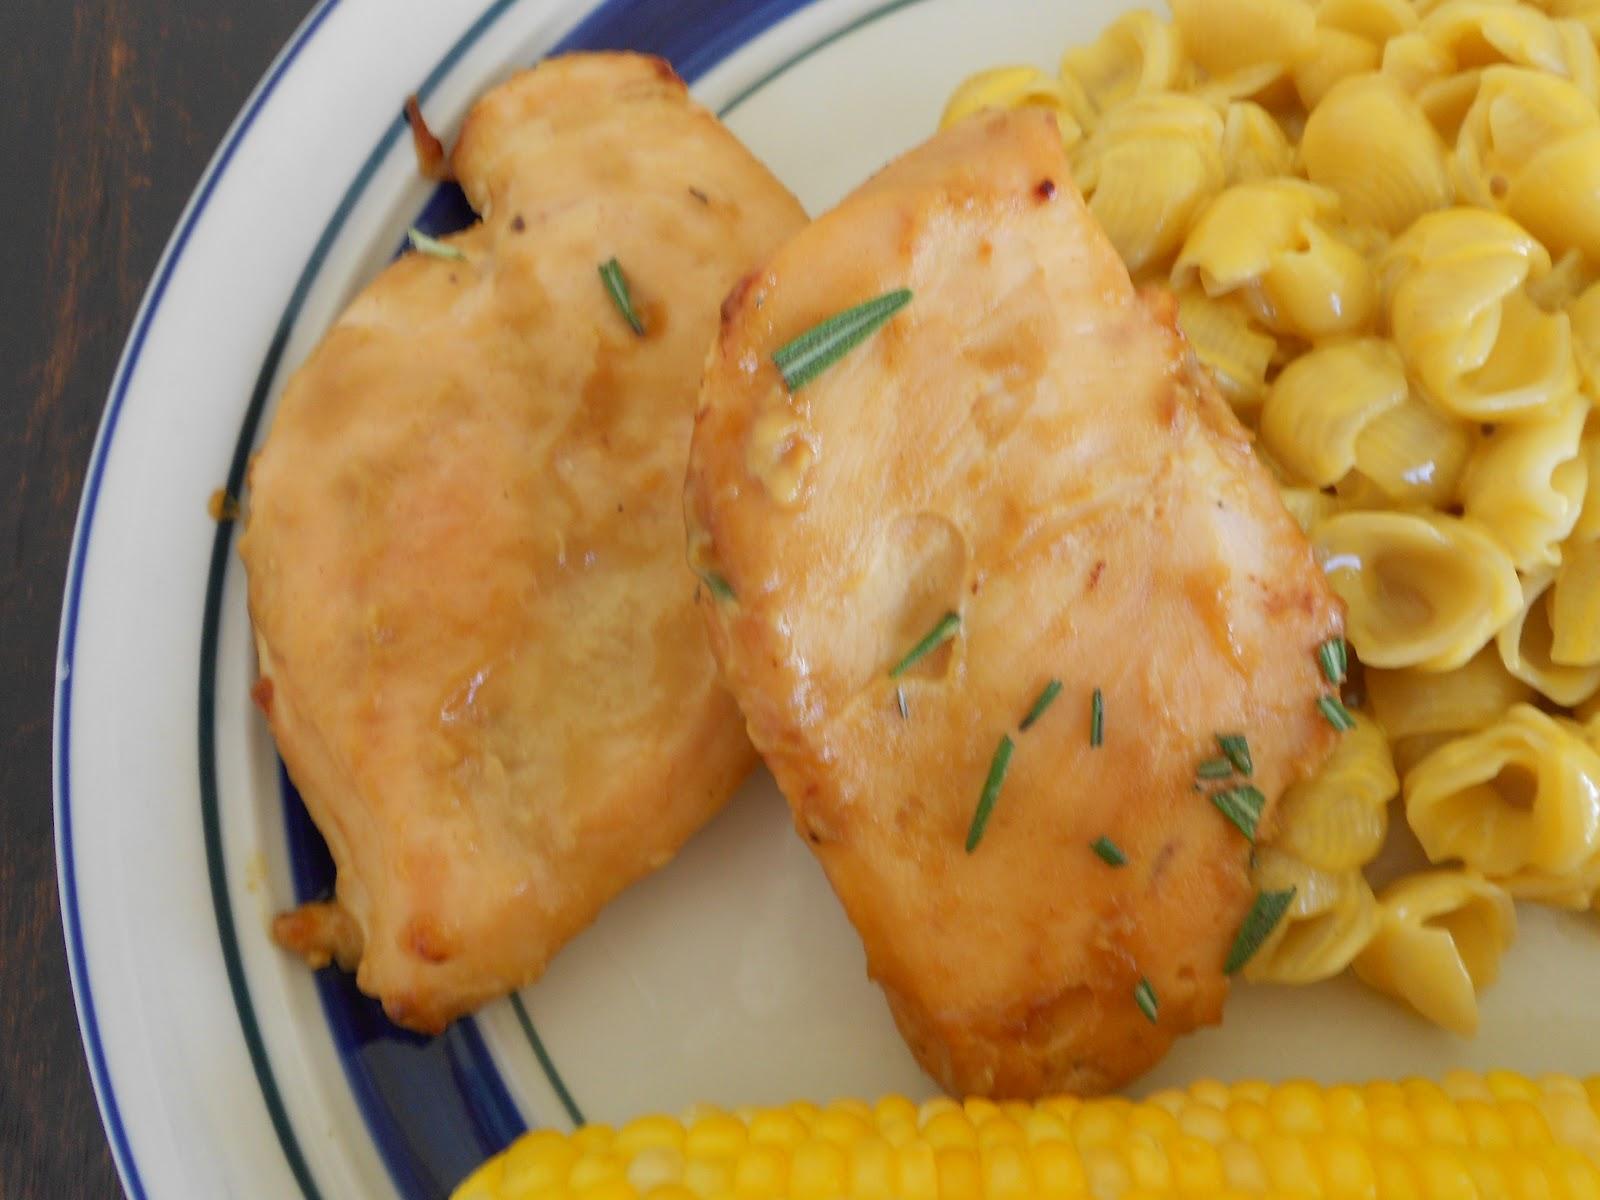 The Pub and Grub Forum: Maple Dijon Chicken Breasts